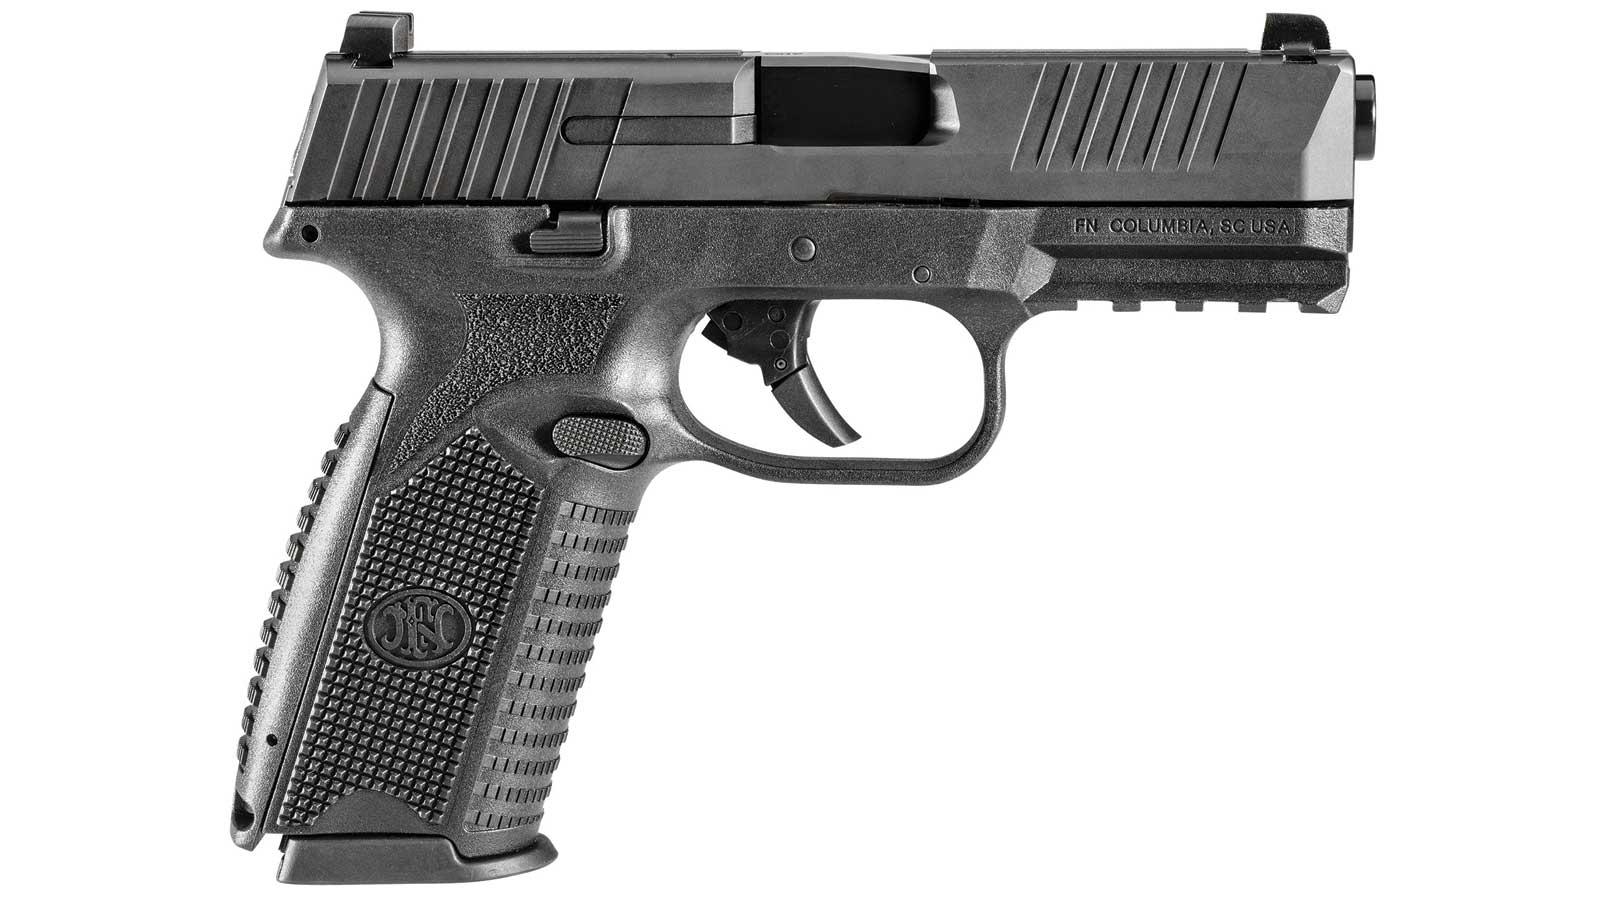 FN 66100003 FN 509 Double 9mm Luger 4 10+1 Black Interchangeable Backstrap Grip Black in.